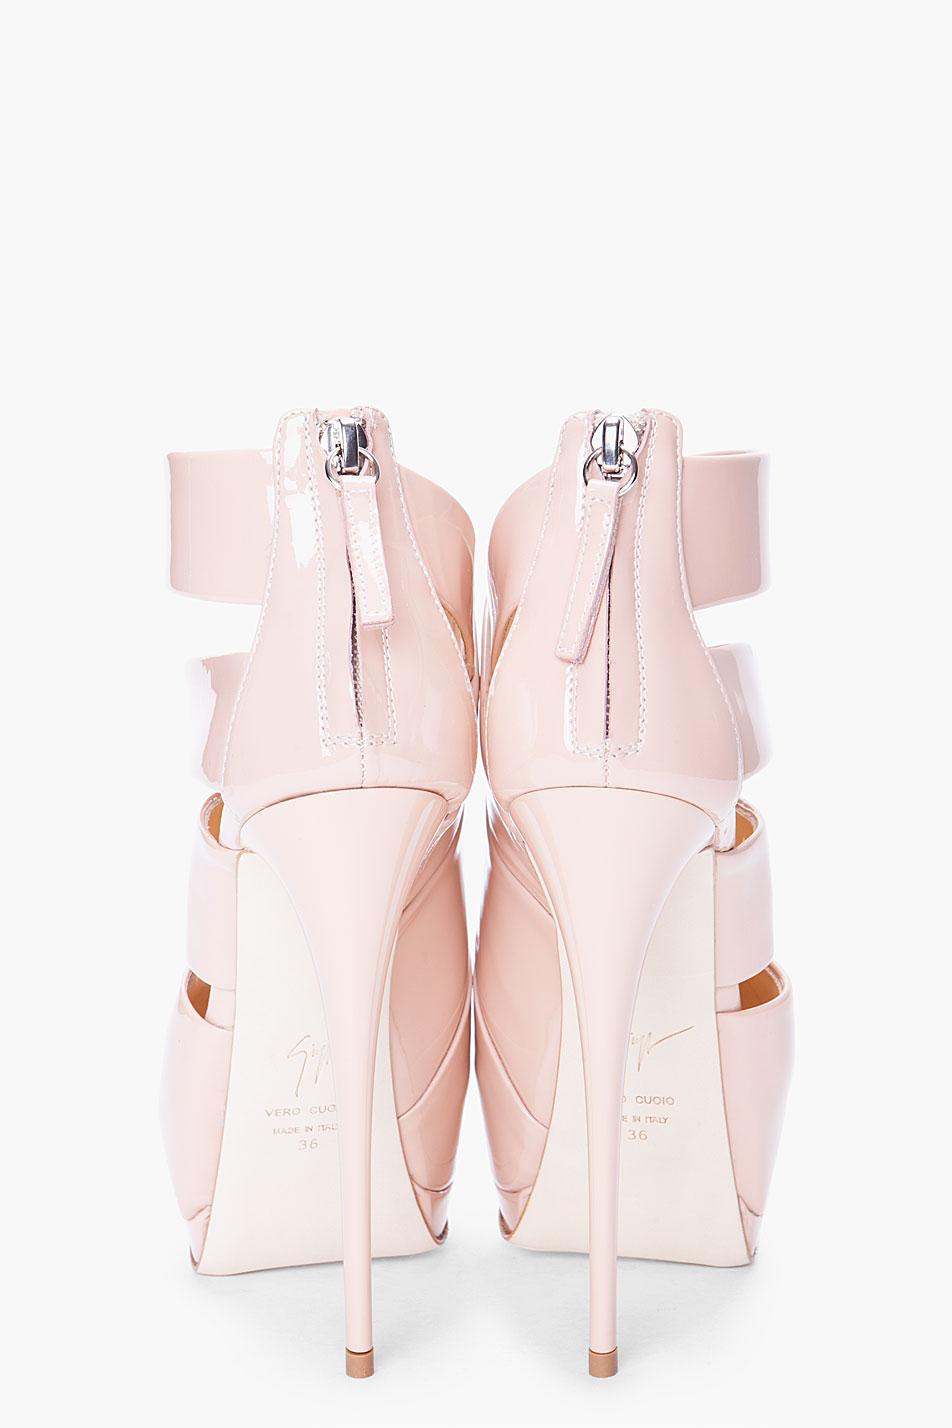 Giuseppe Zanotti Leather Alien Double Strap Nude High